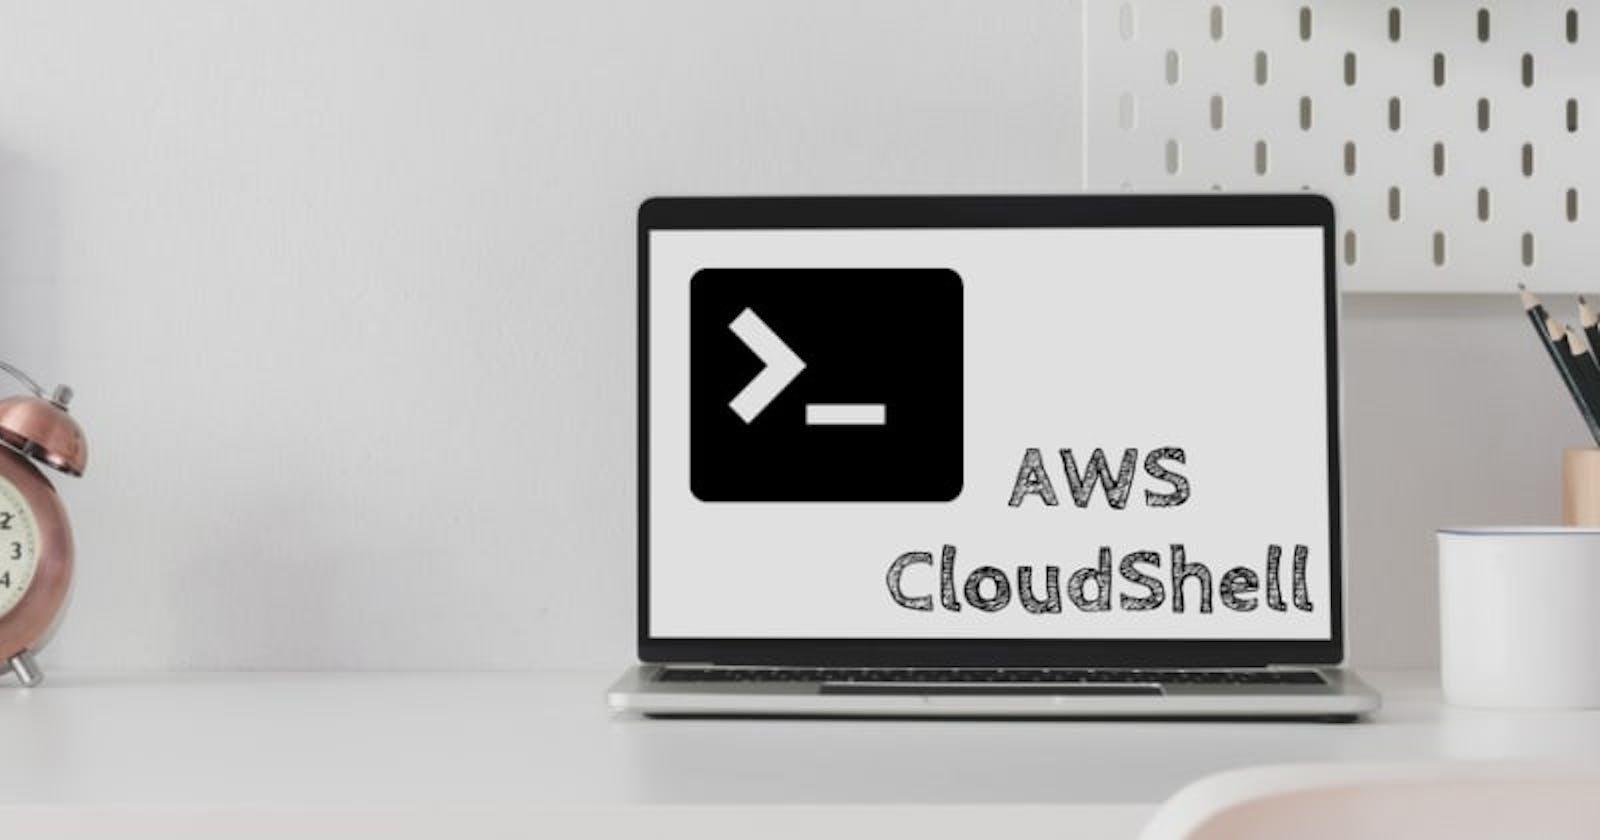 Inicializando AWS CloudShell - 1/3